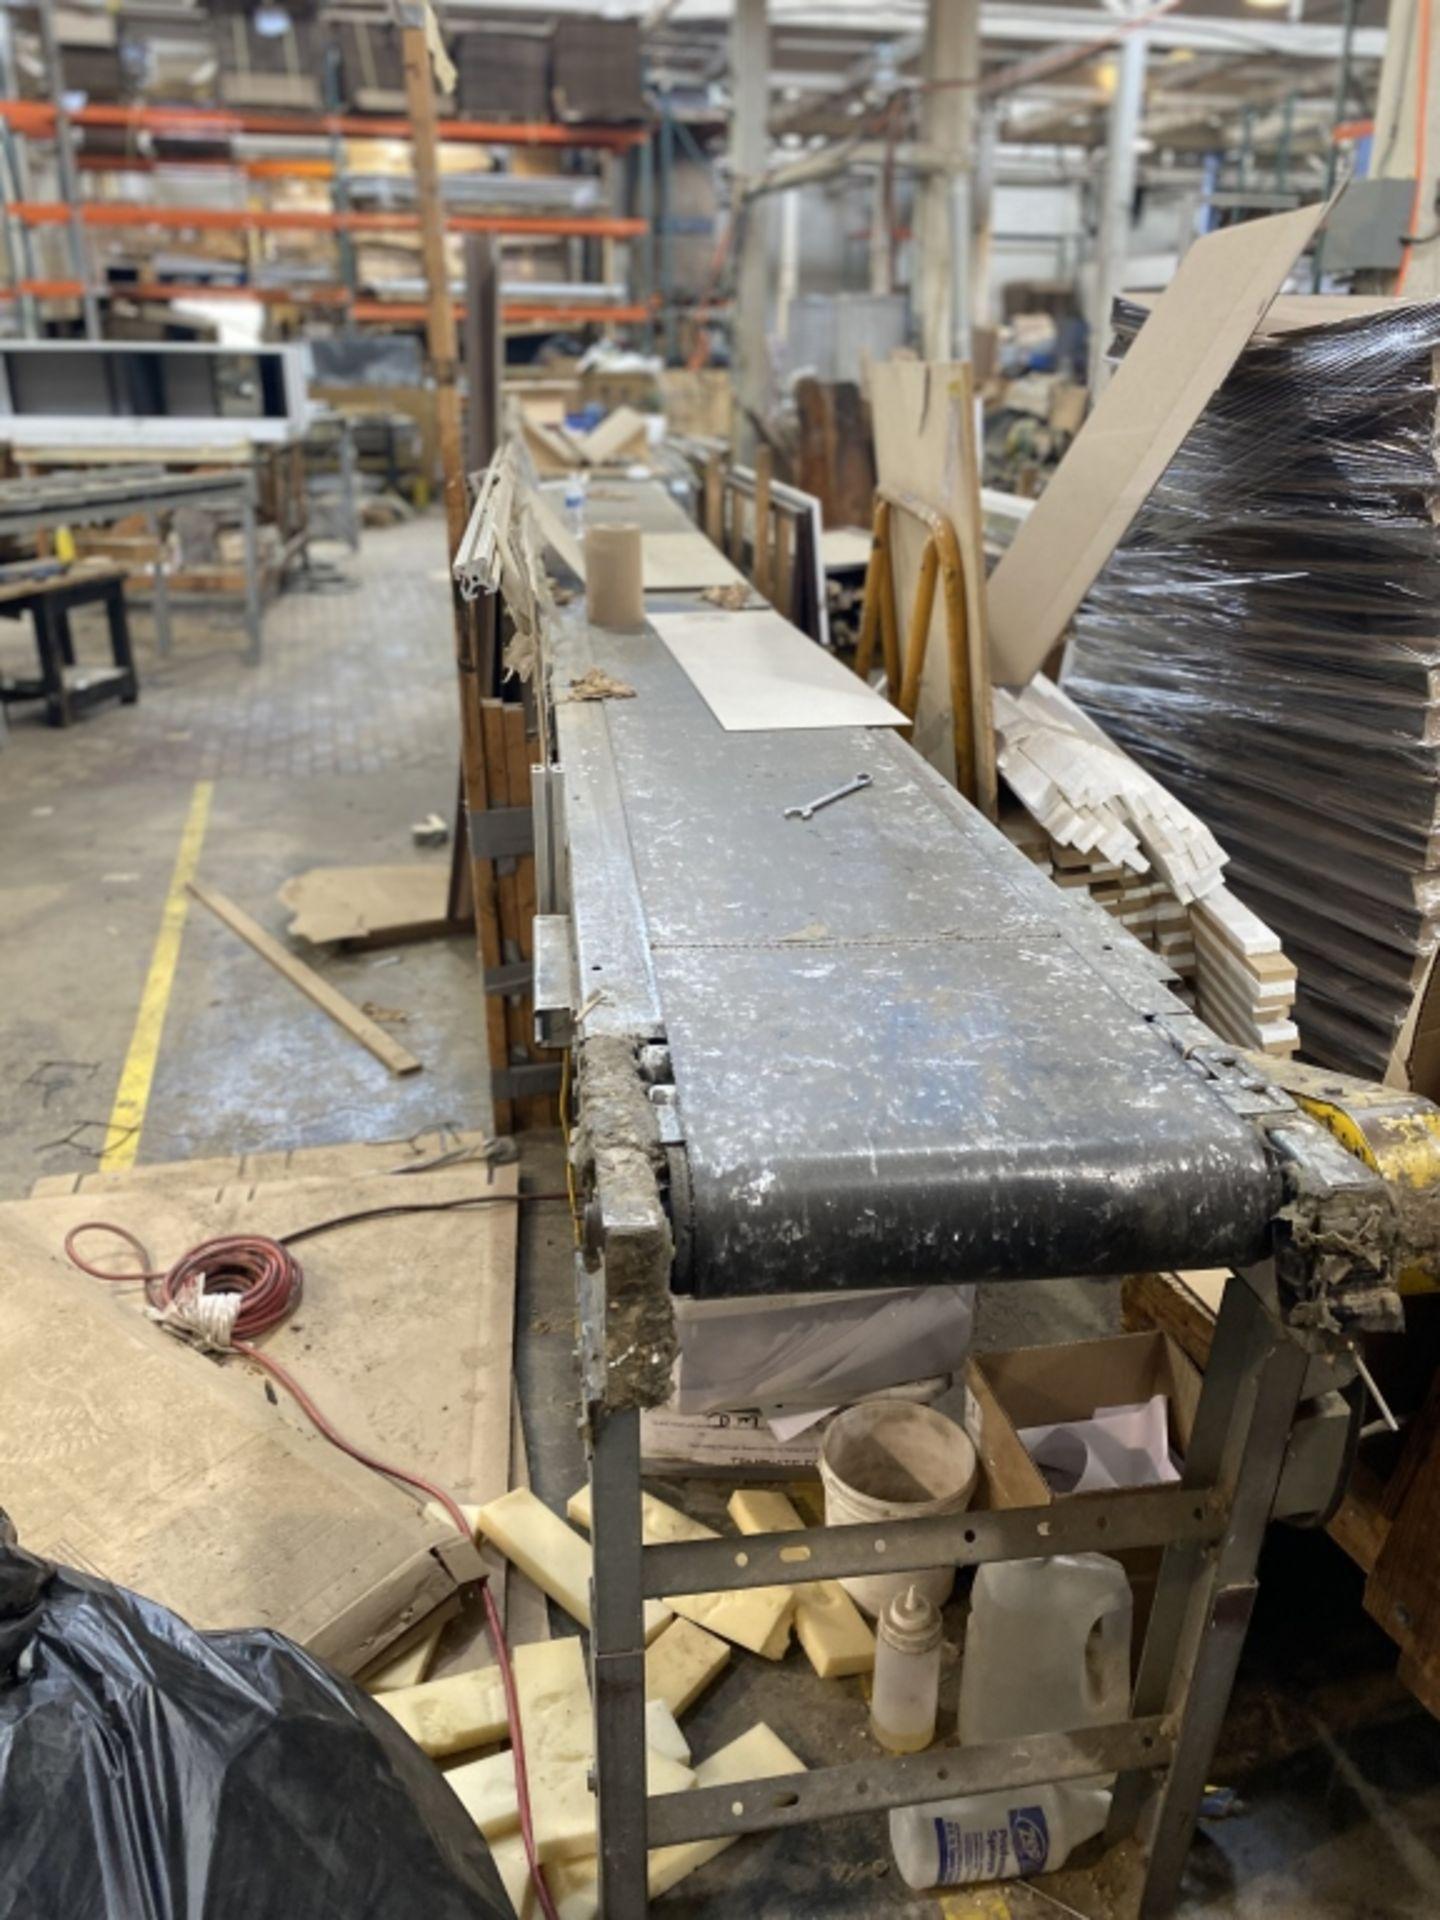 Lot 1039 - Conveyor 20' x 32' belt